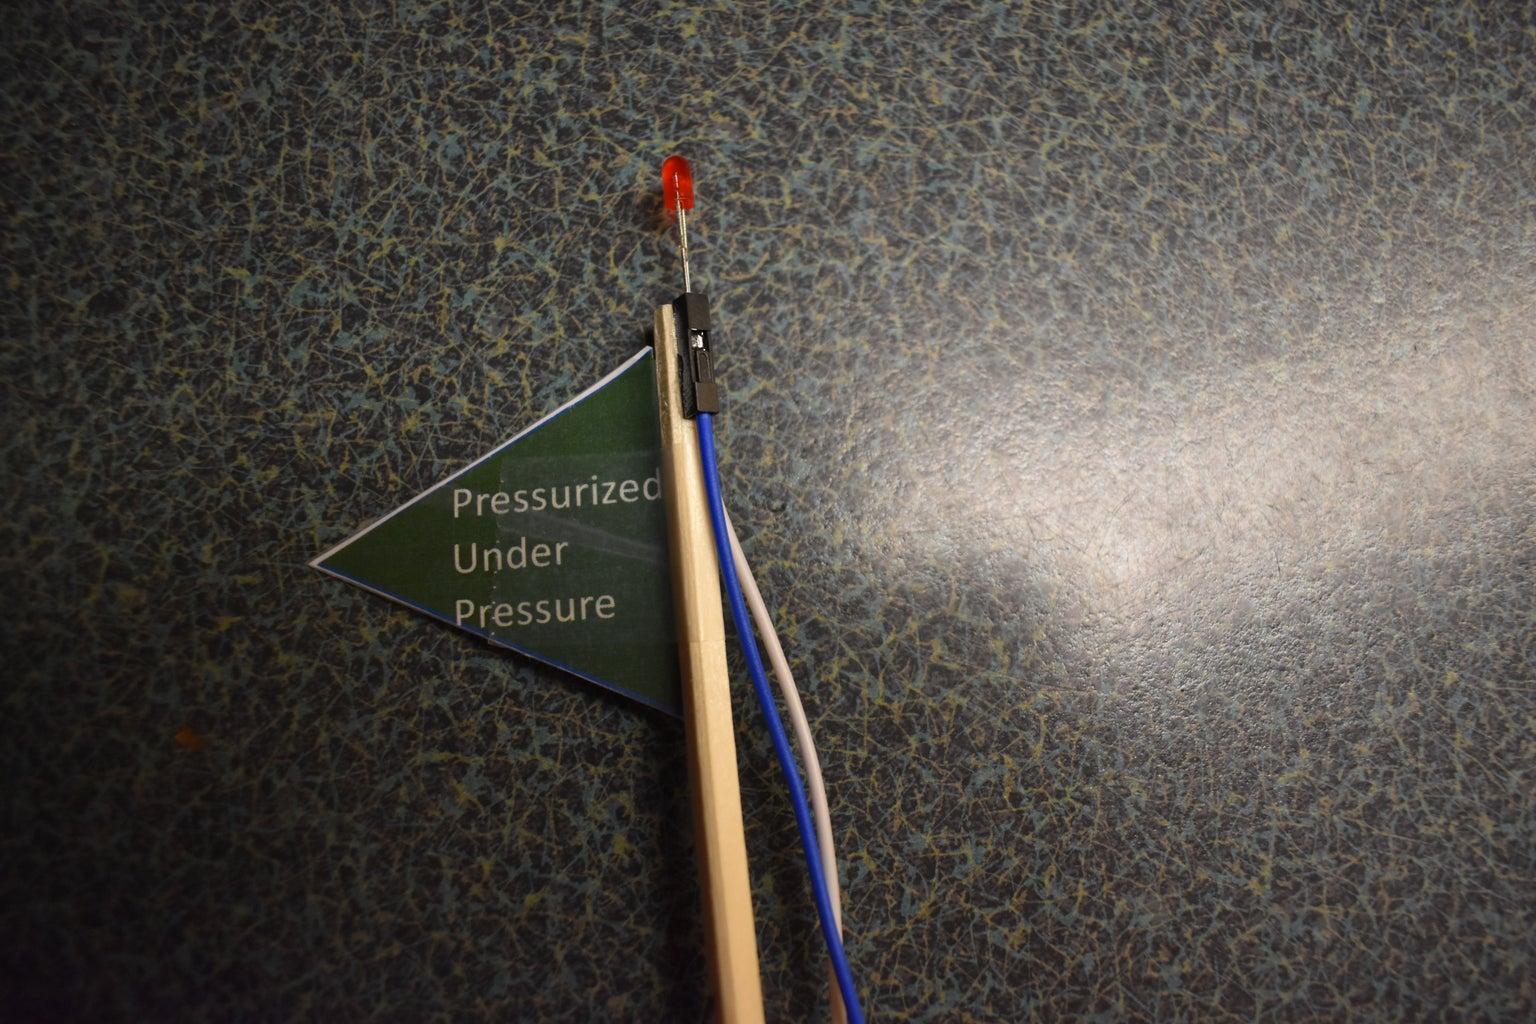 Creating the Pressurized Hazard Flag